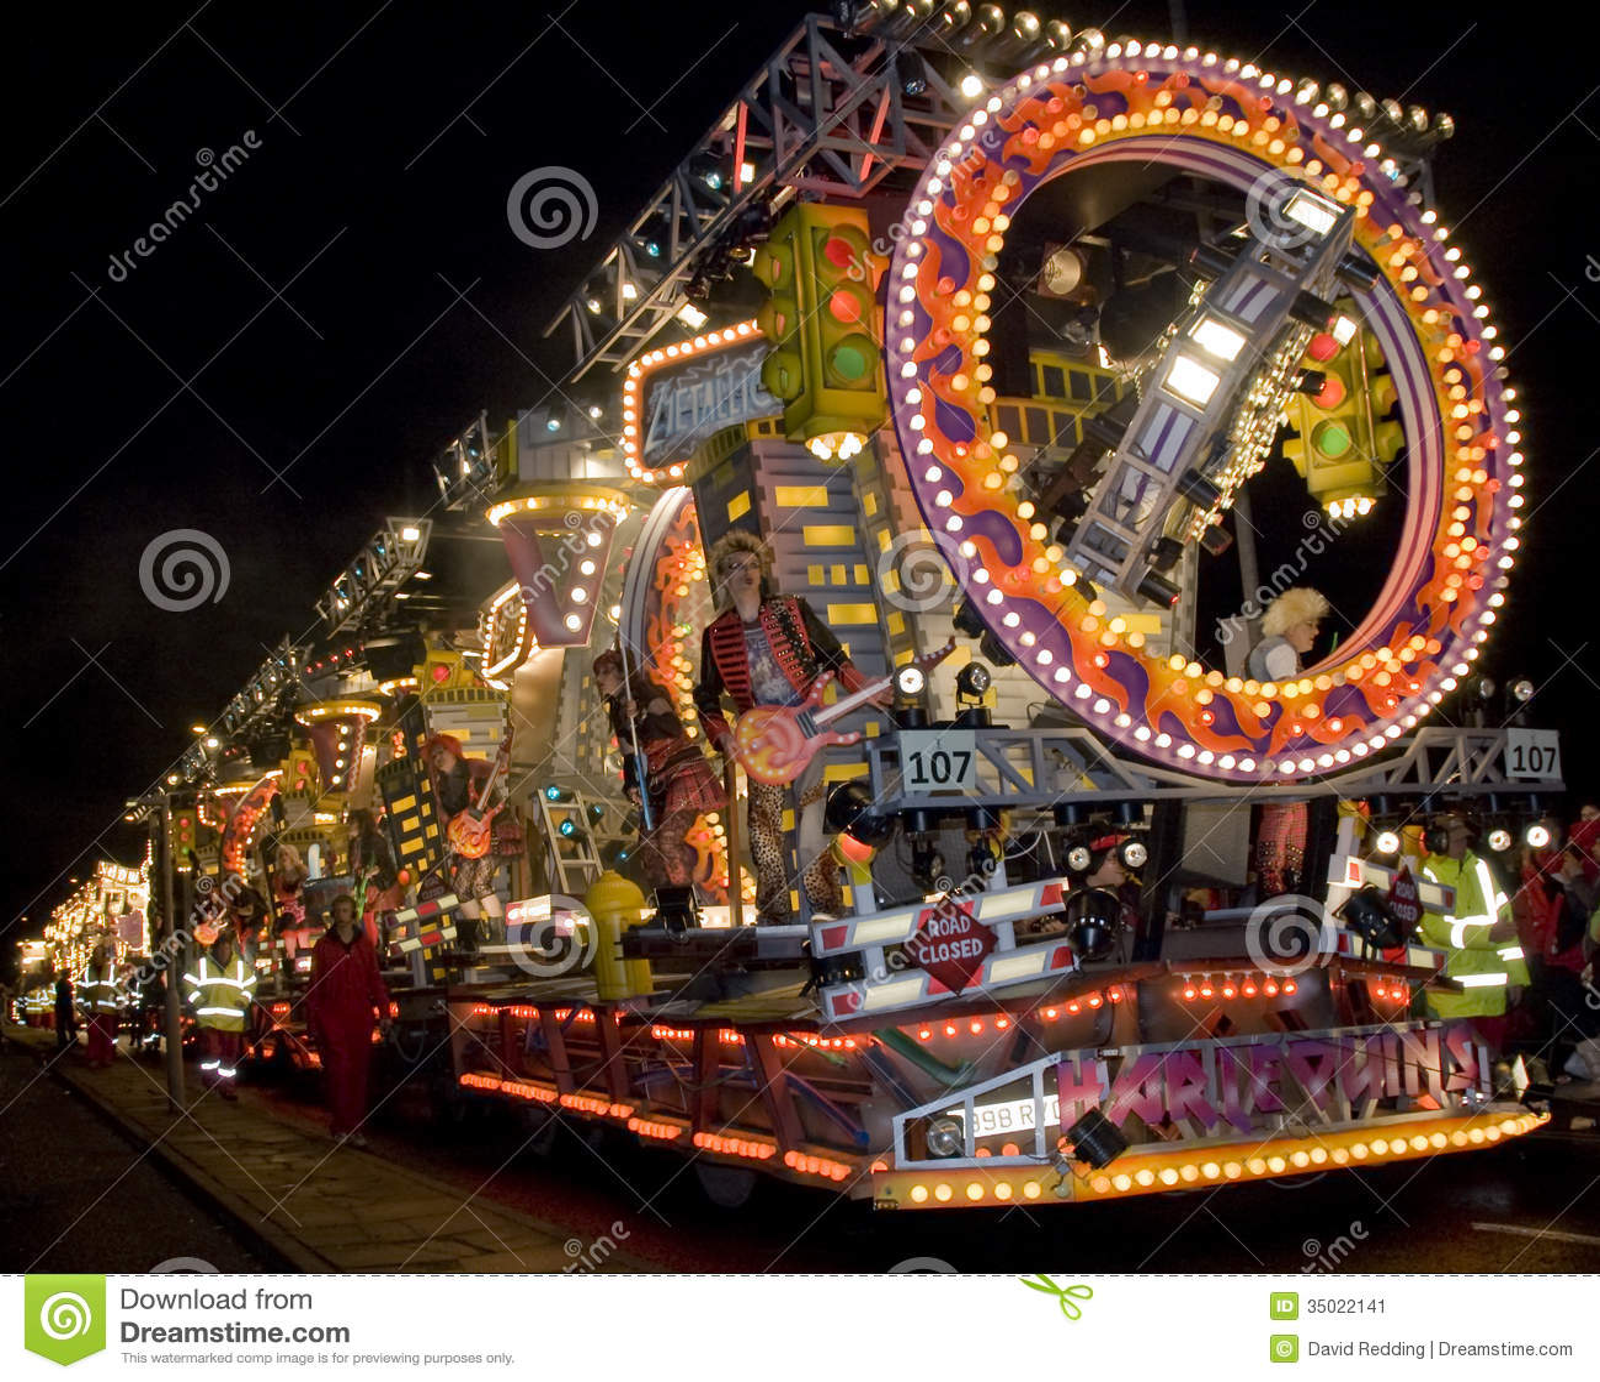 Bridgewater Carnival Float Editorial Photo Image 35022141